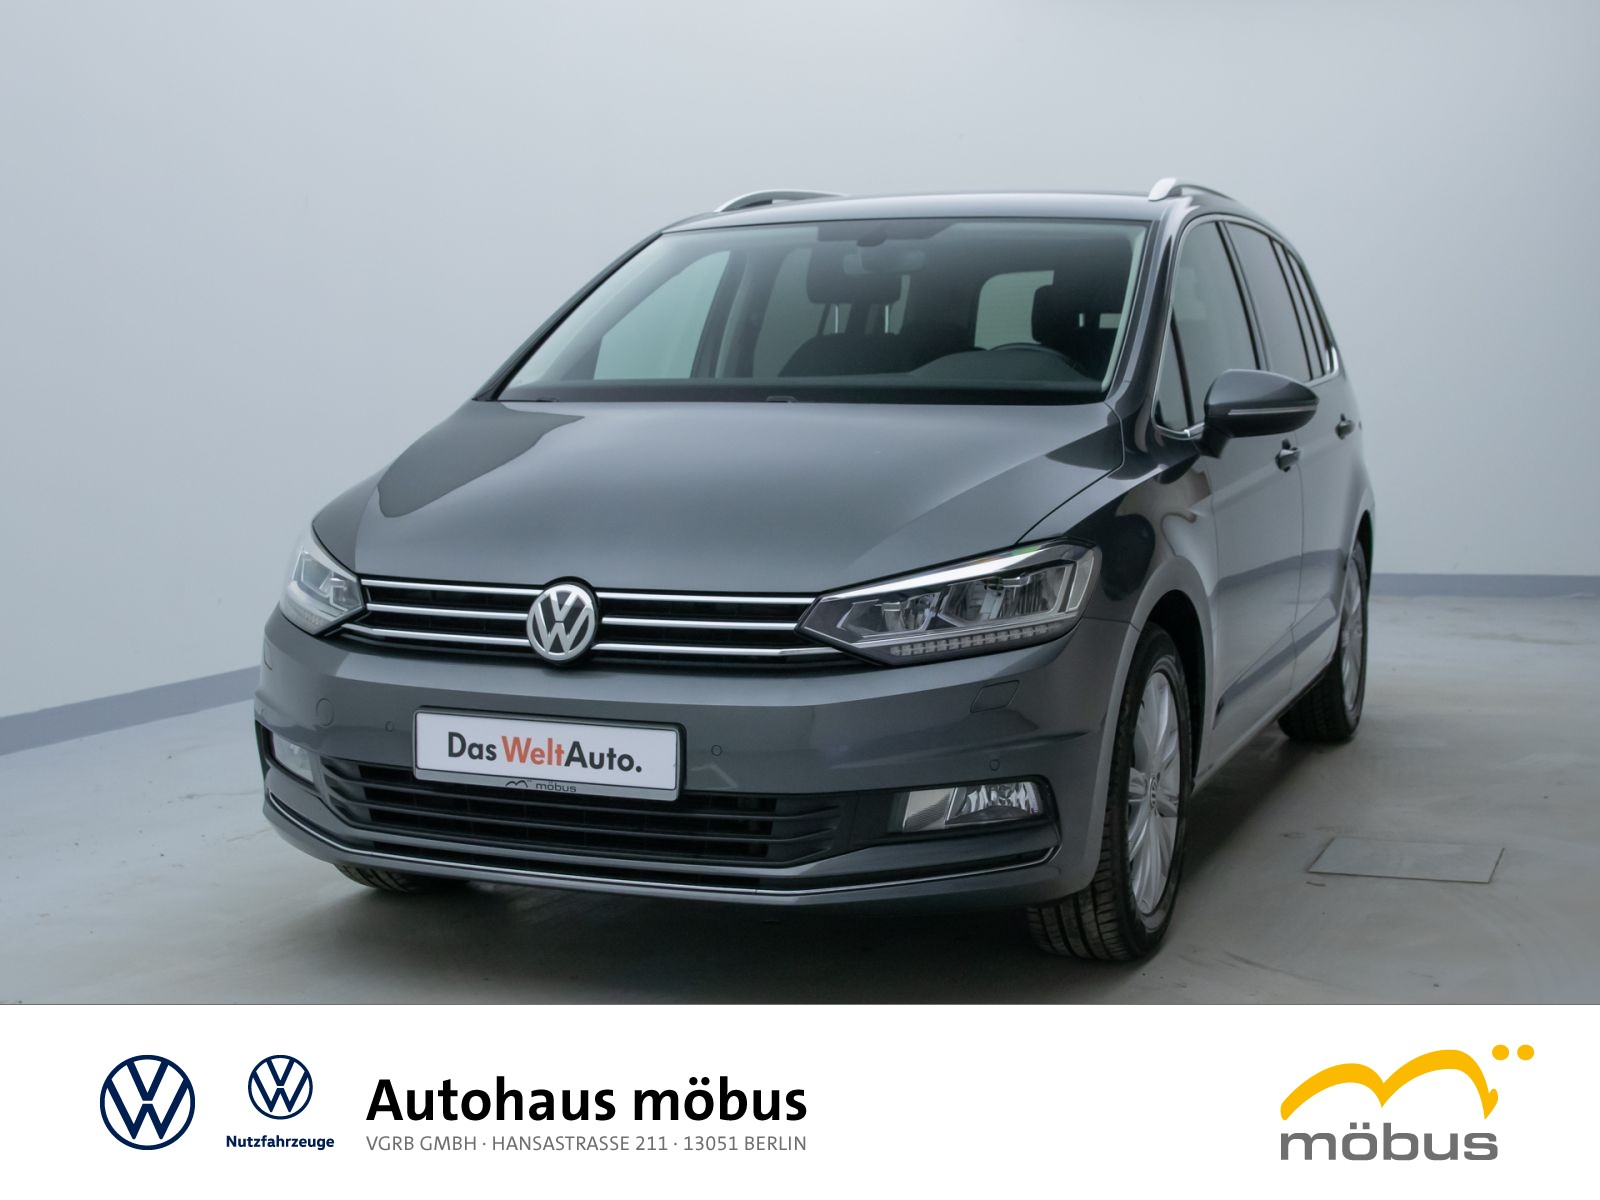 Volkswagen Touran 1.4 TSI DSG*HIGHL*7-SITZ*RFK*LED*ACC*NAVI, Jahr 2017, Benzin